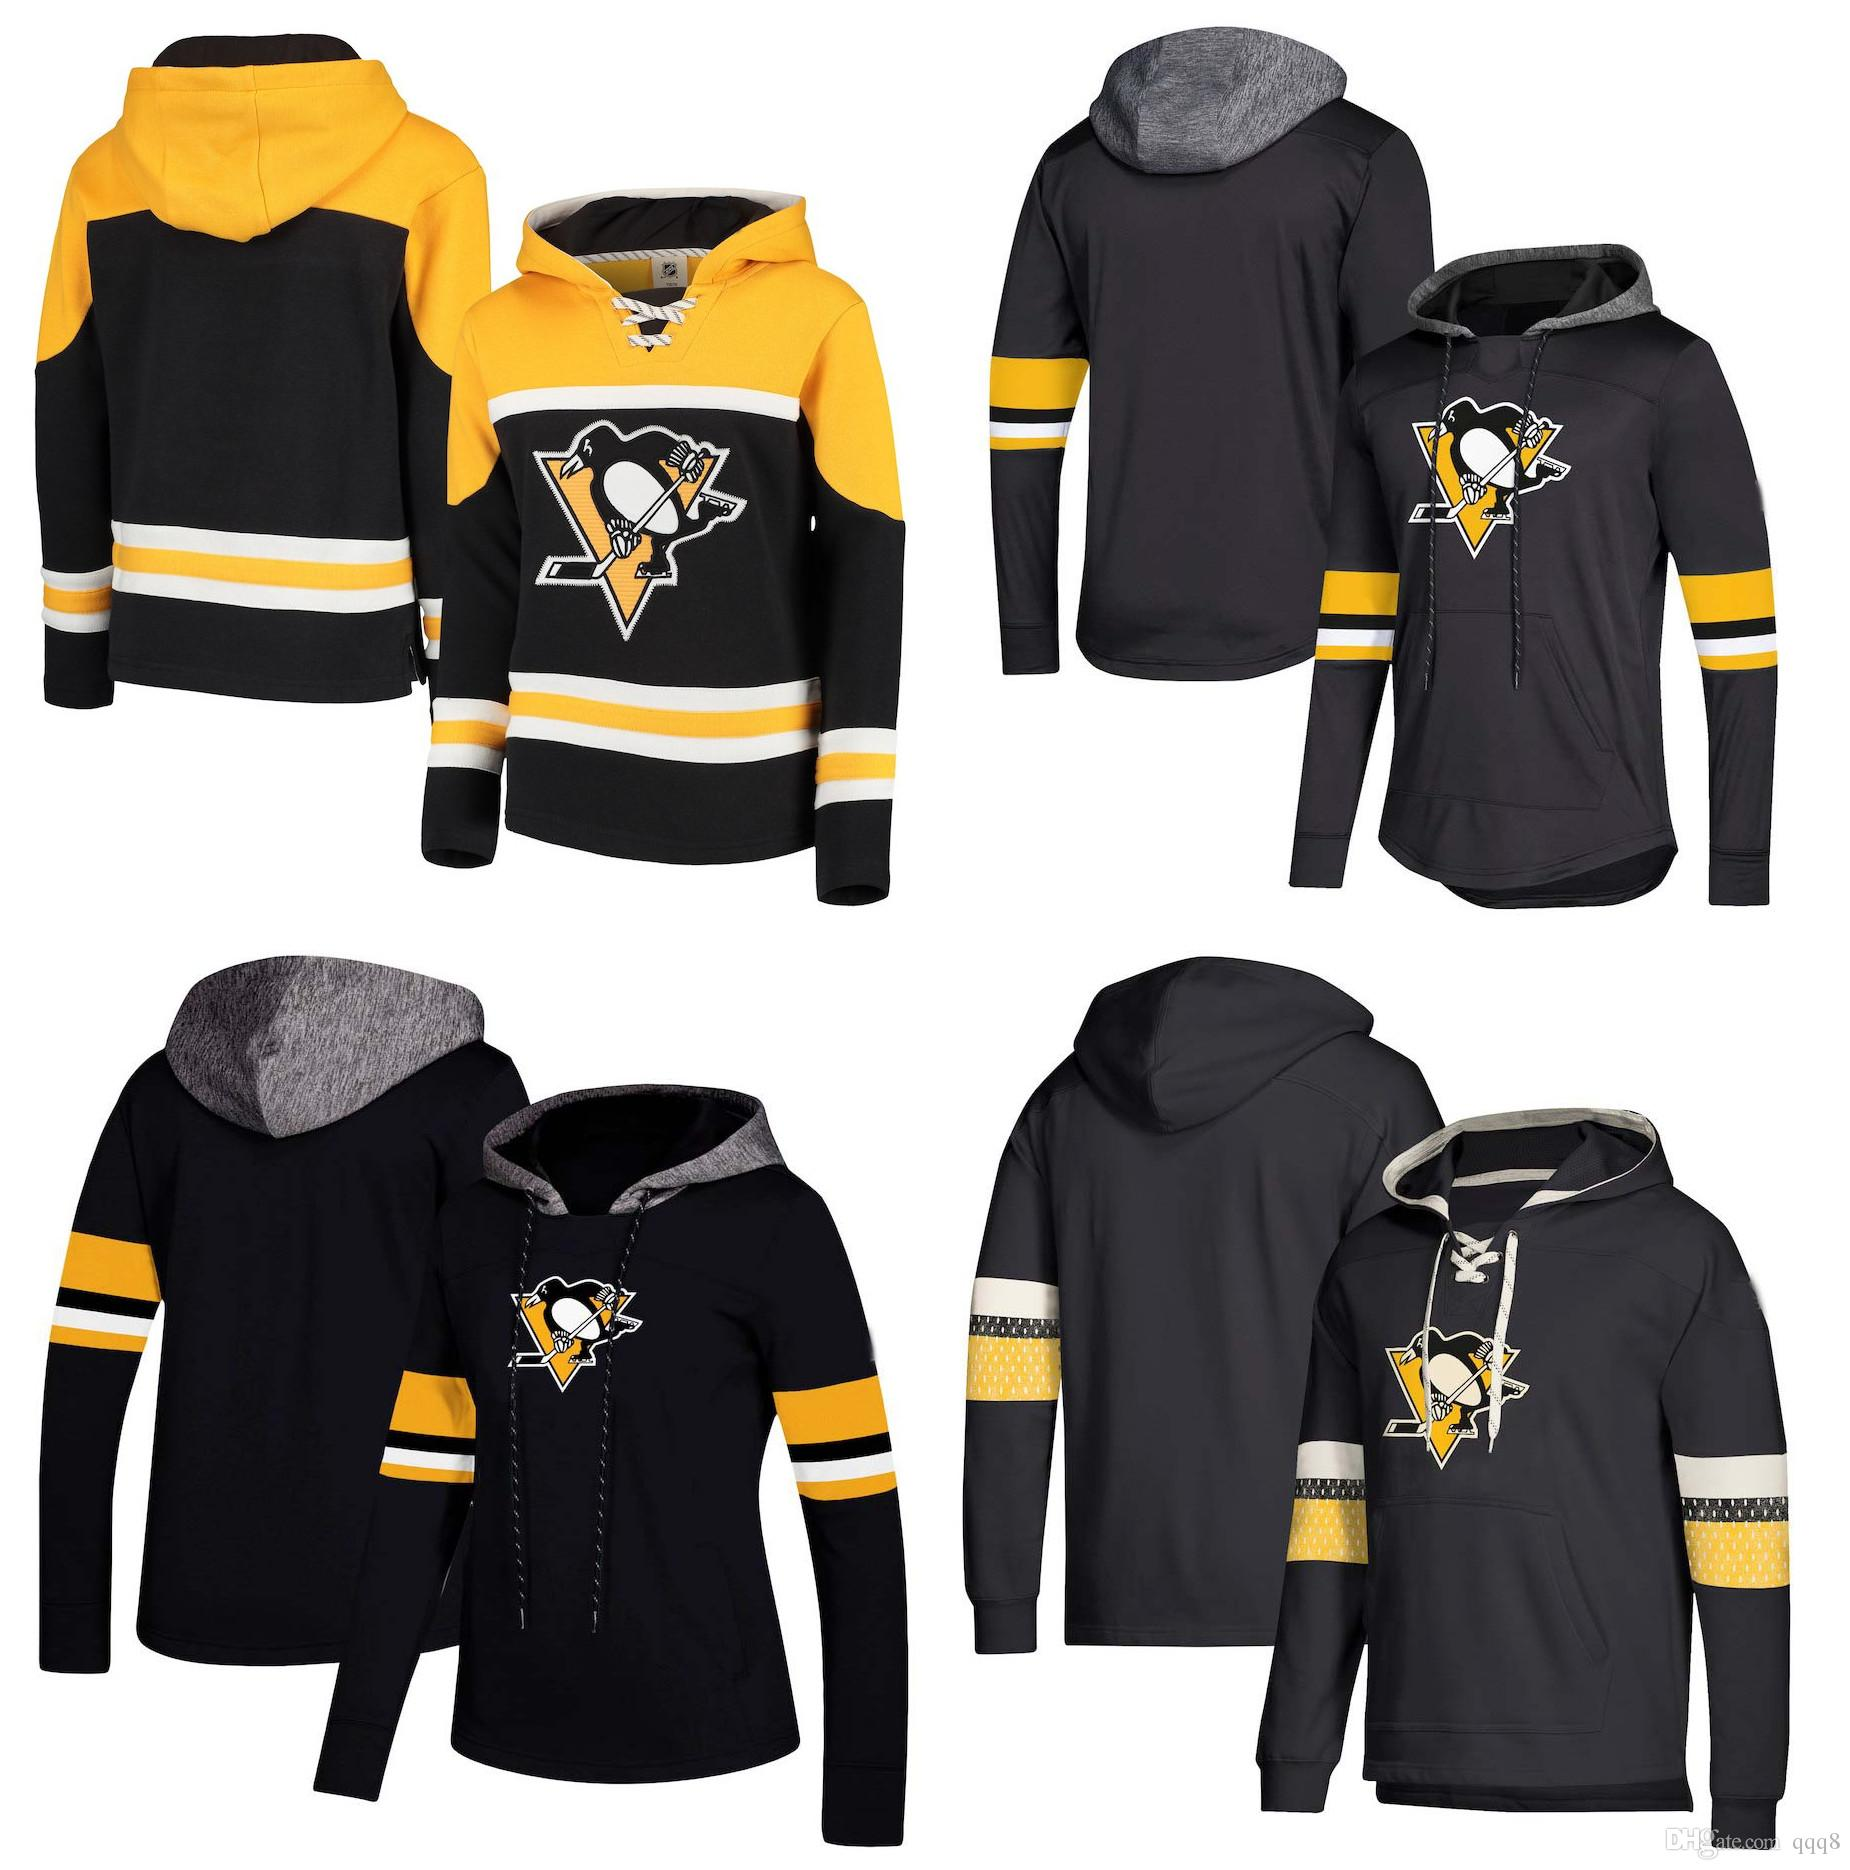 2e39043e6da 2019 2019 Pittsburgh Penguins Hoodie Sidney Crosby Jake Guentzel Phil  Kessel Malkin Rust Maatta Dumoulin Hagelin Jarry Stitched Hockey Pullover  From Qqq8